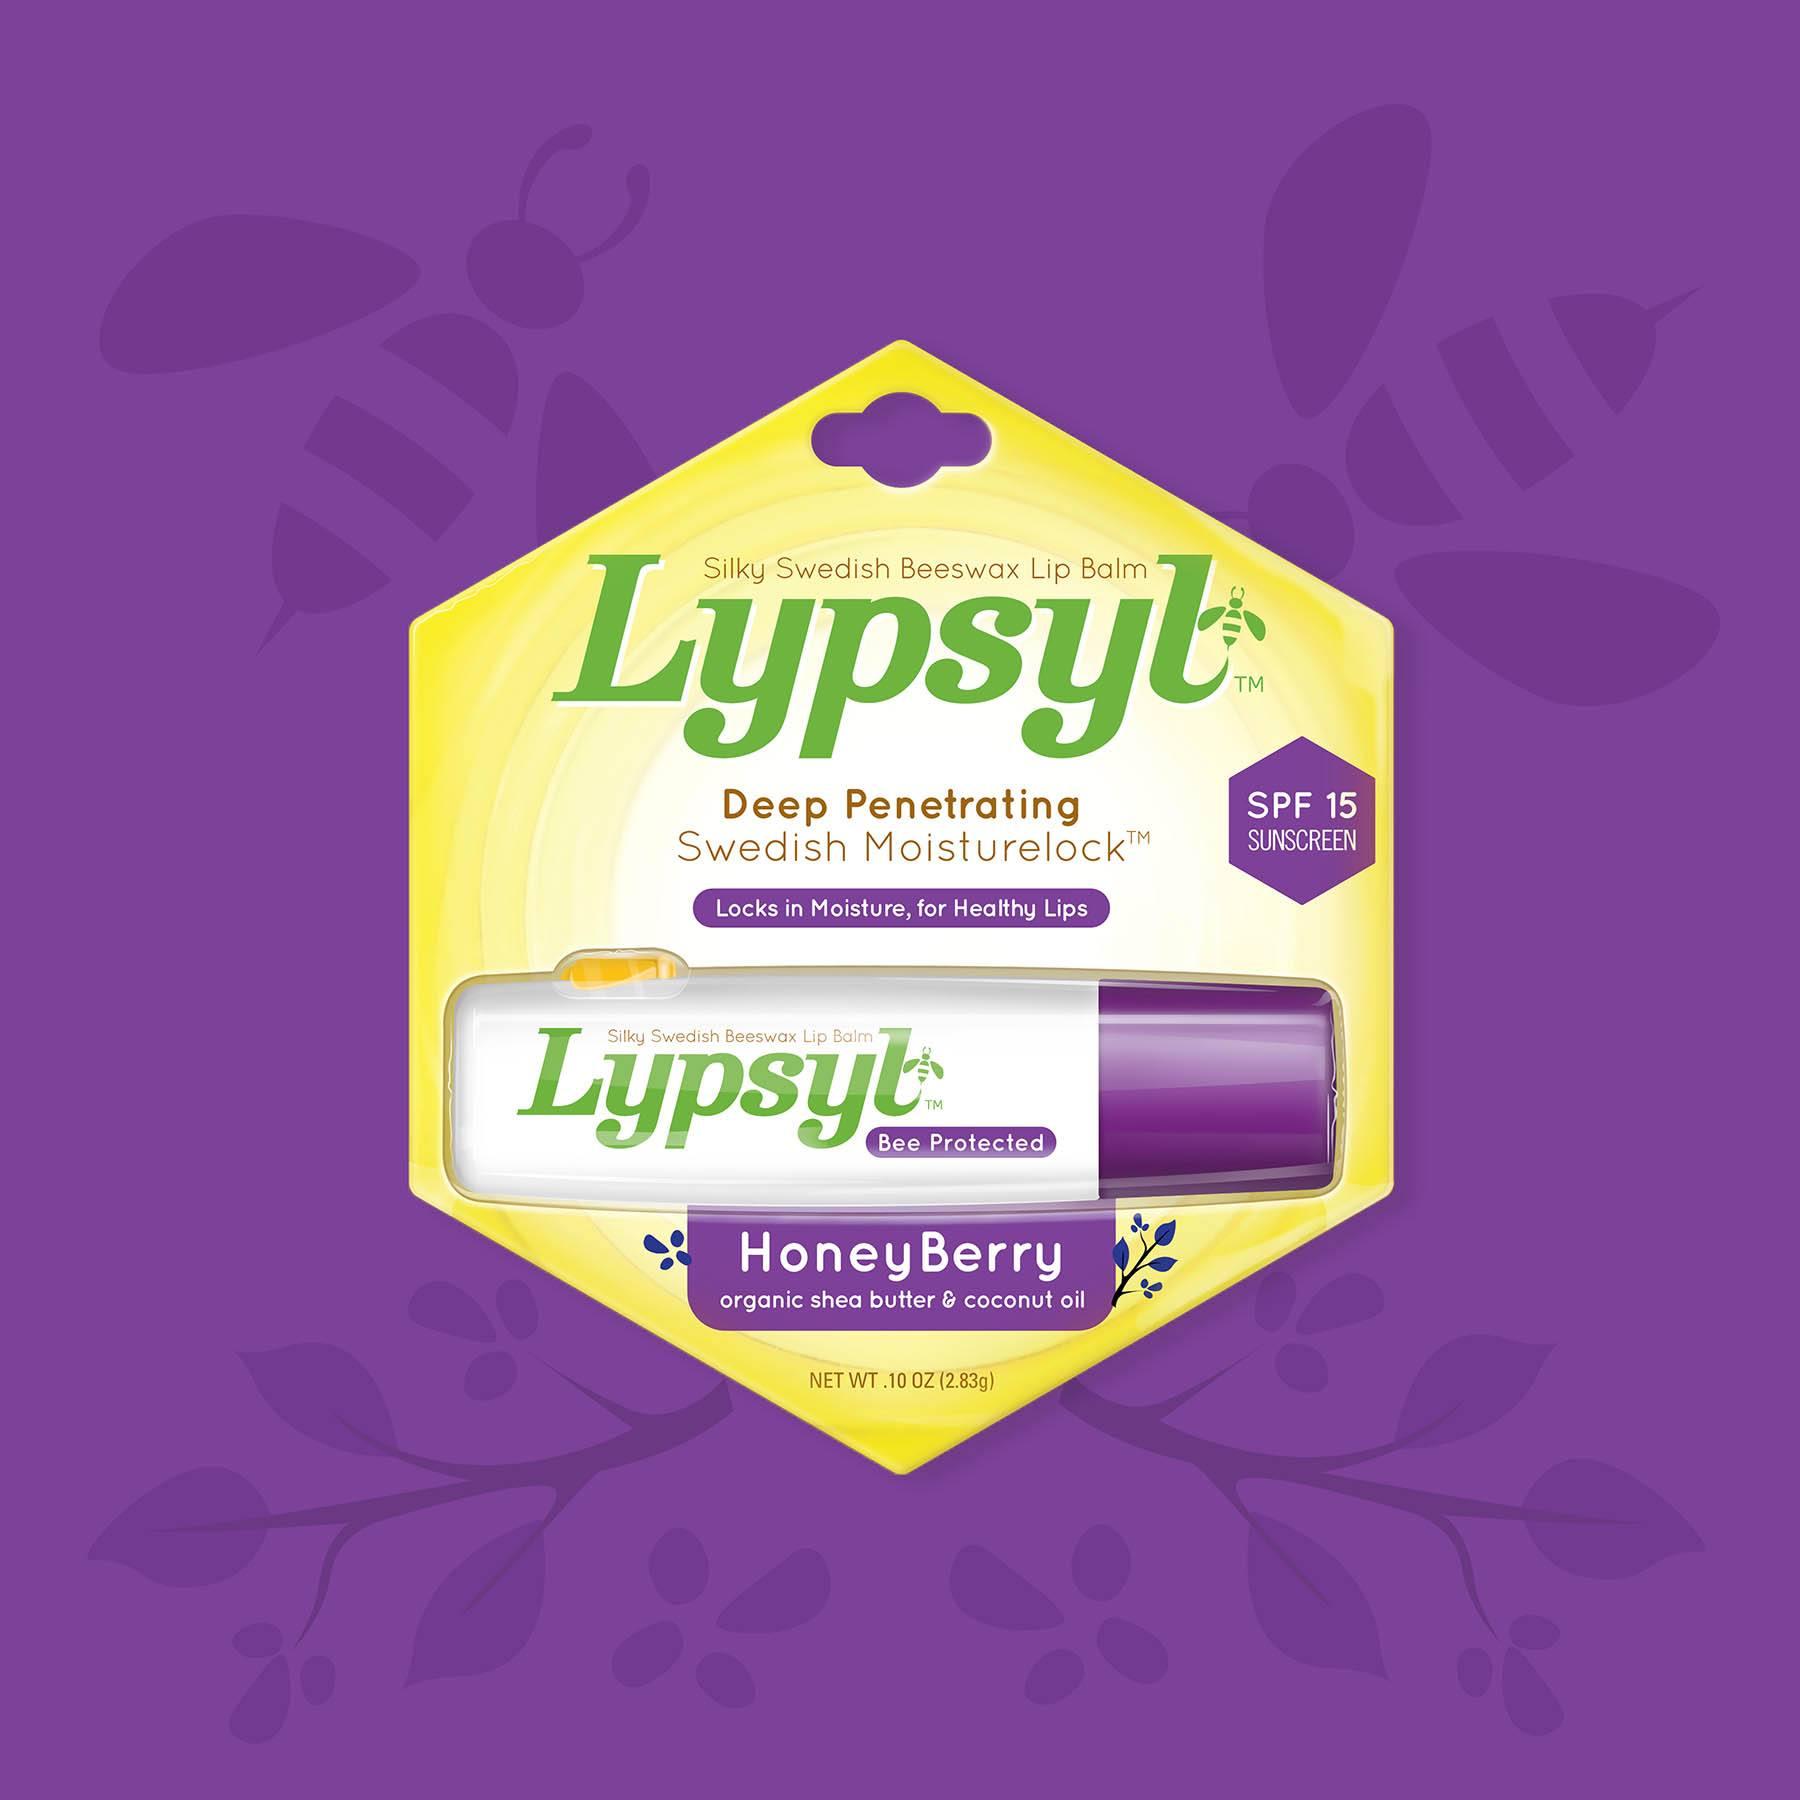 Lypsyl Lip Balm HoneyBerry Package Design